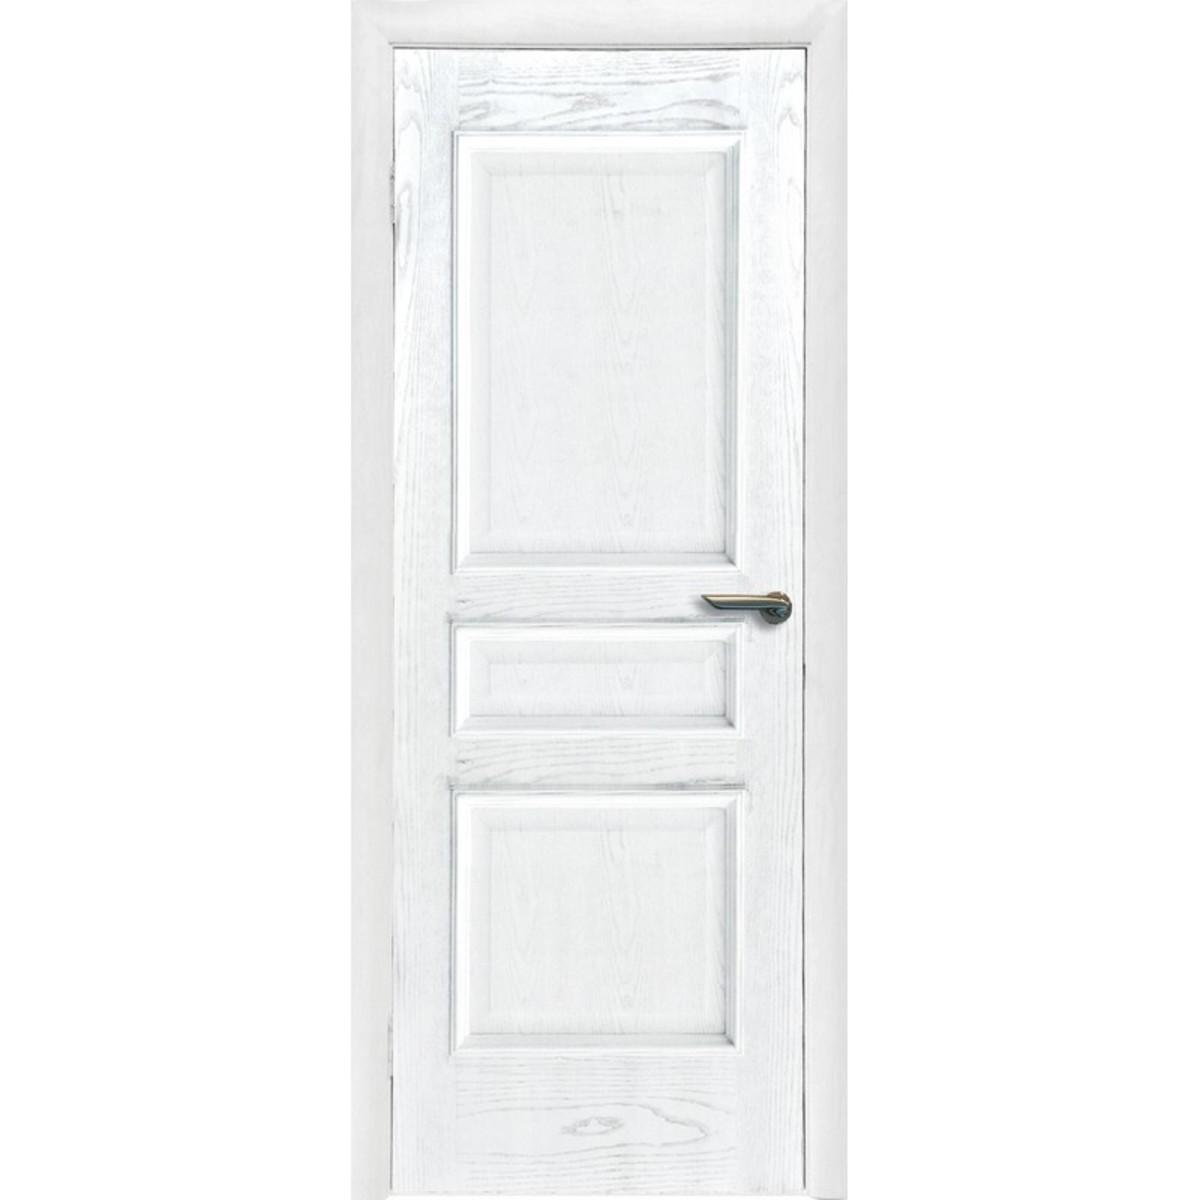 Дверь Межкомнатная Глухая Корона 70x200 Шпон Цвет Ясень